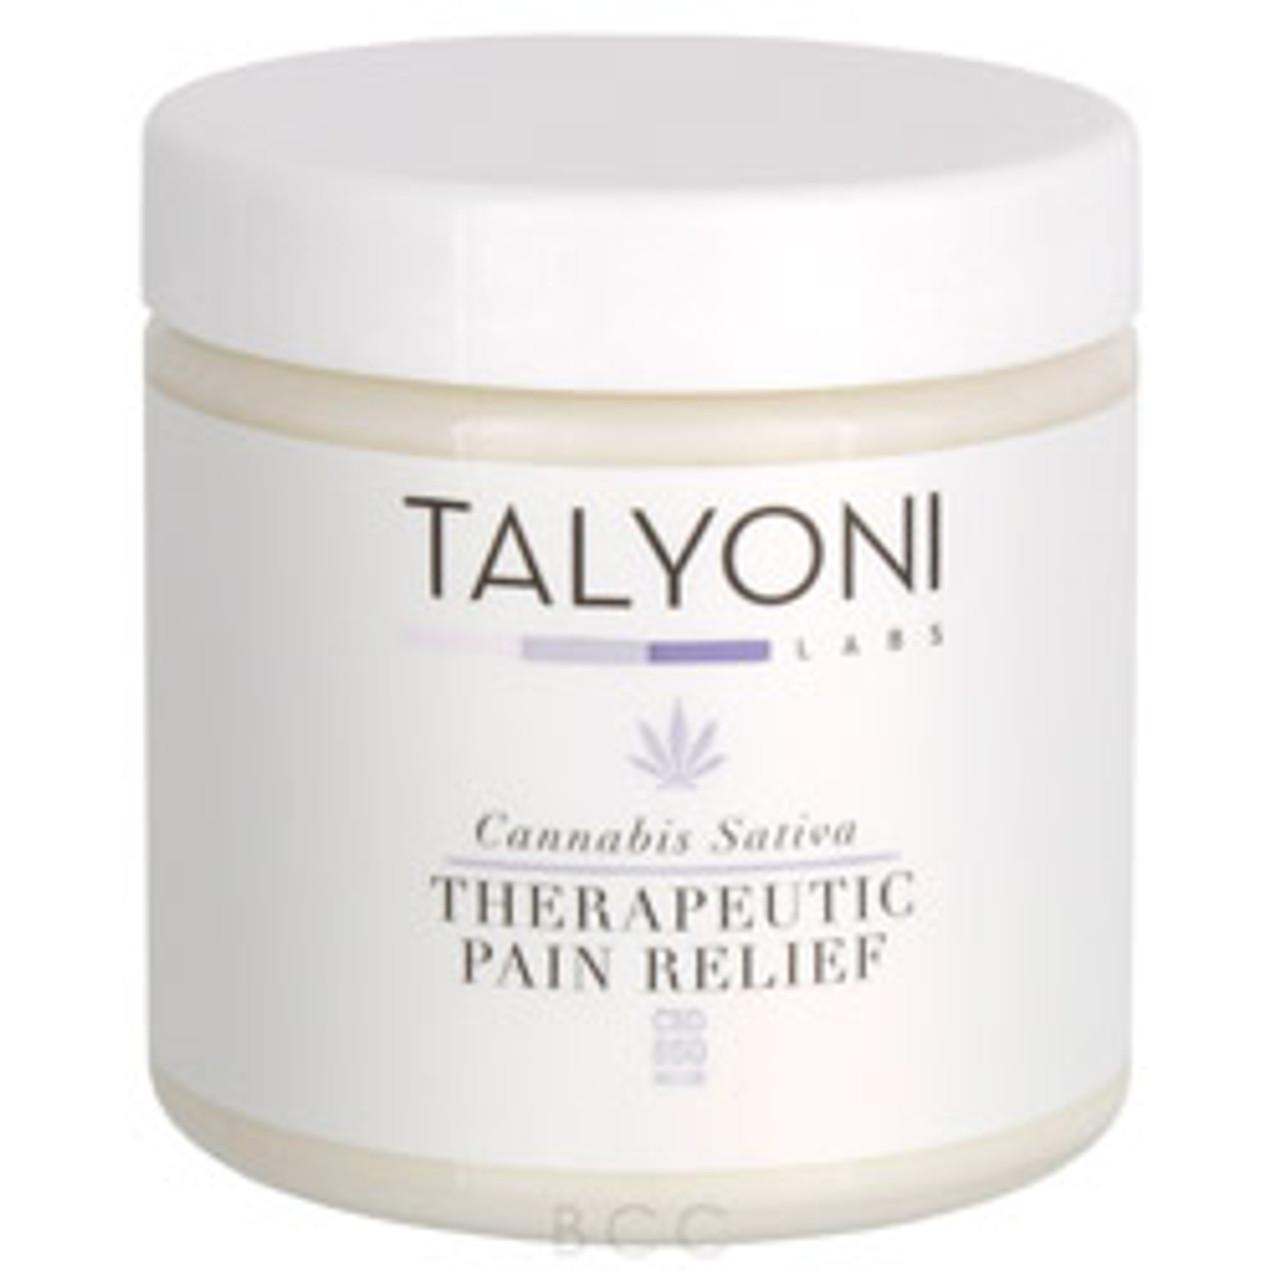 Tay Cbd Pain Relirf Cream 4 Oz